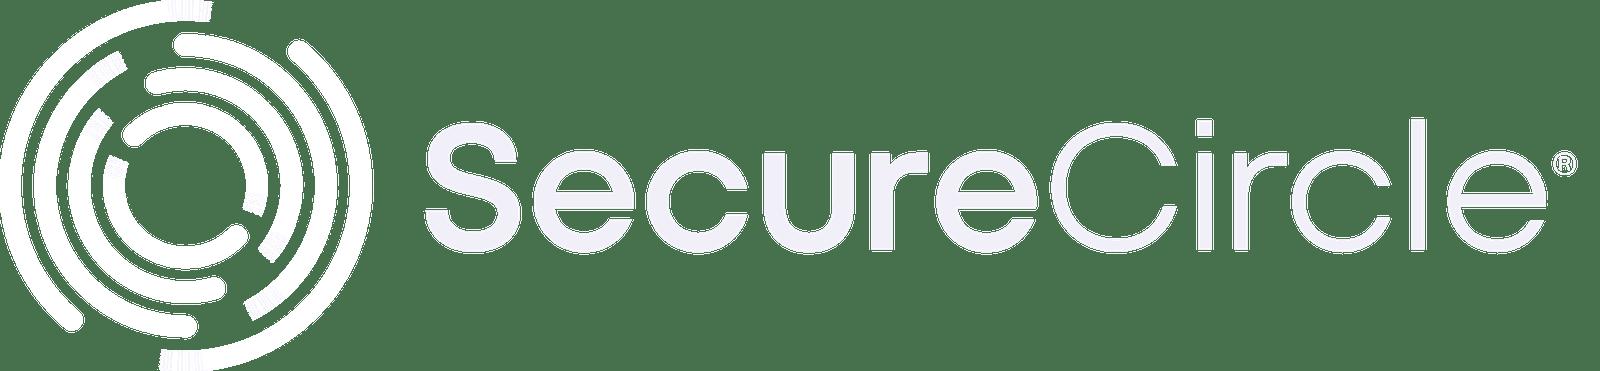 SecureCircle alternate white logo